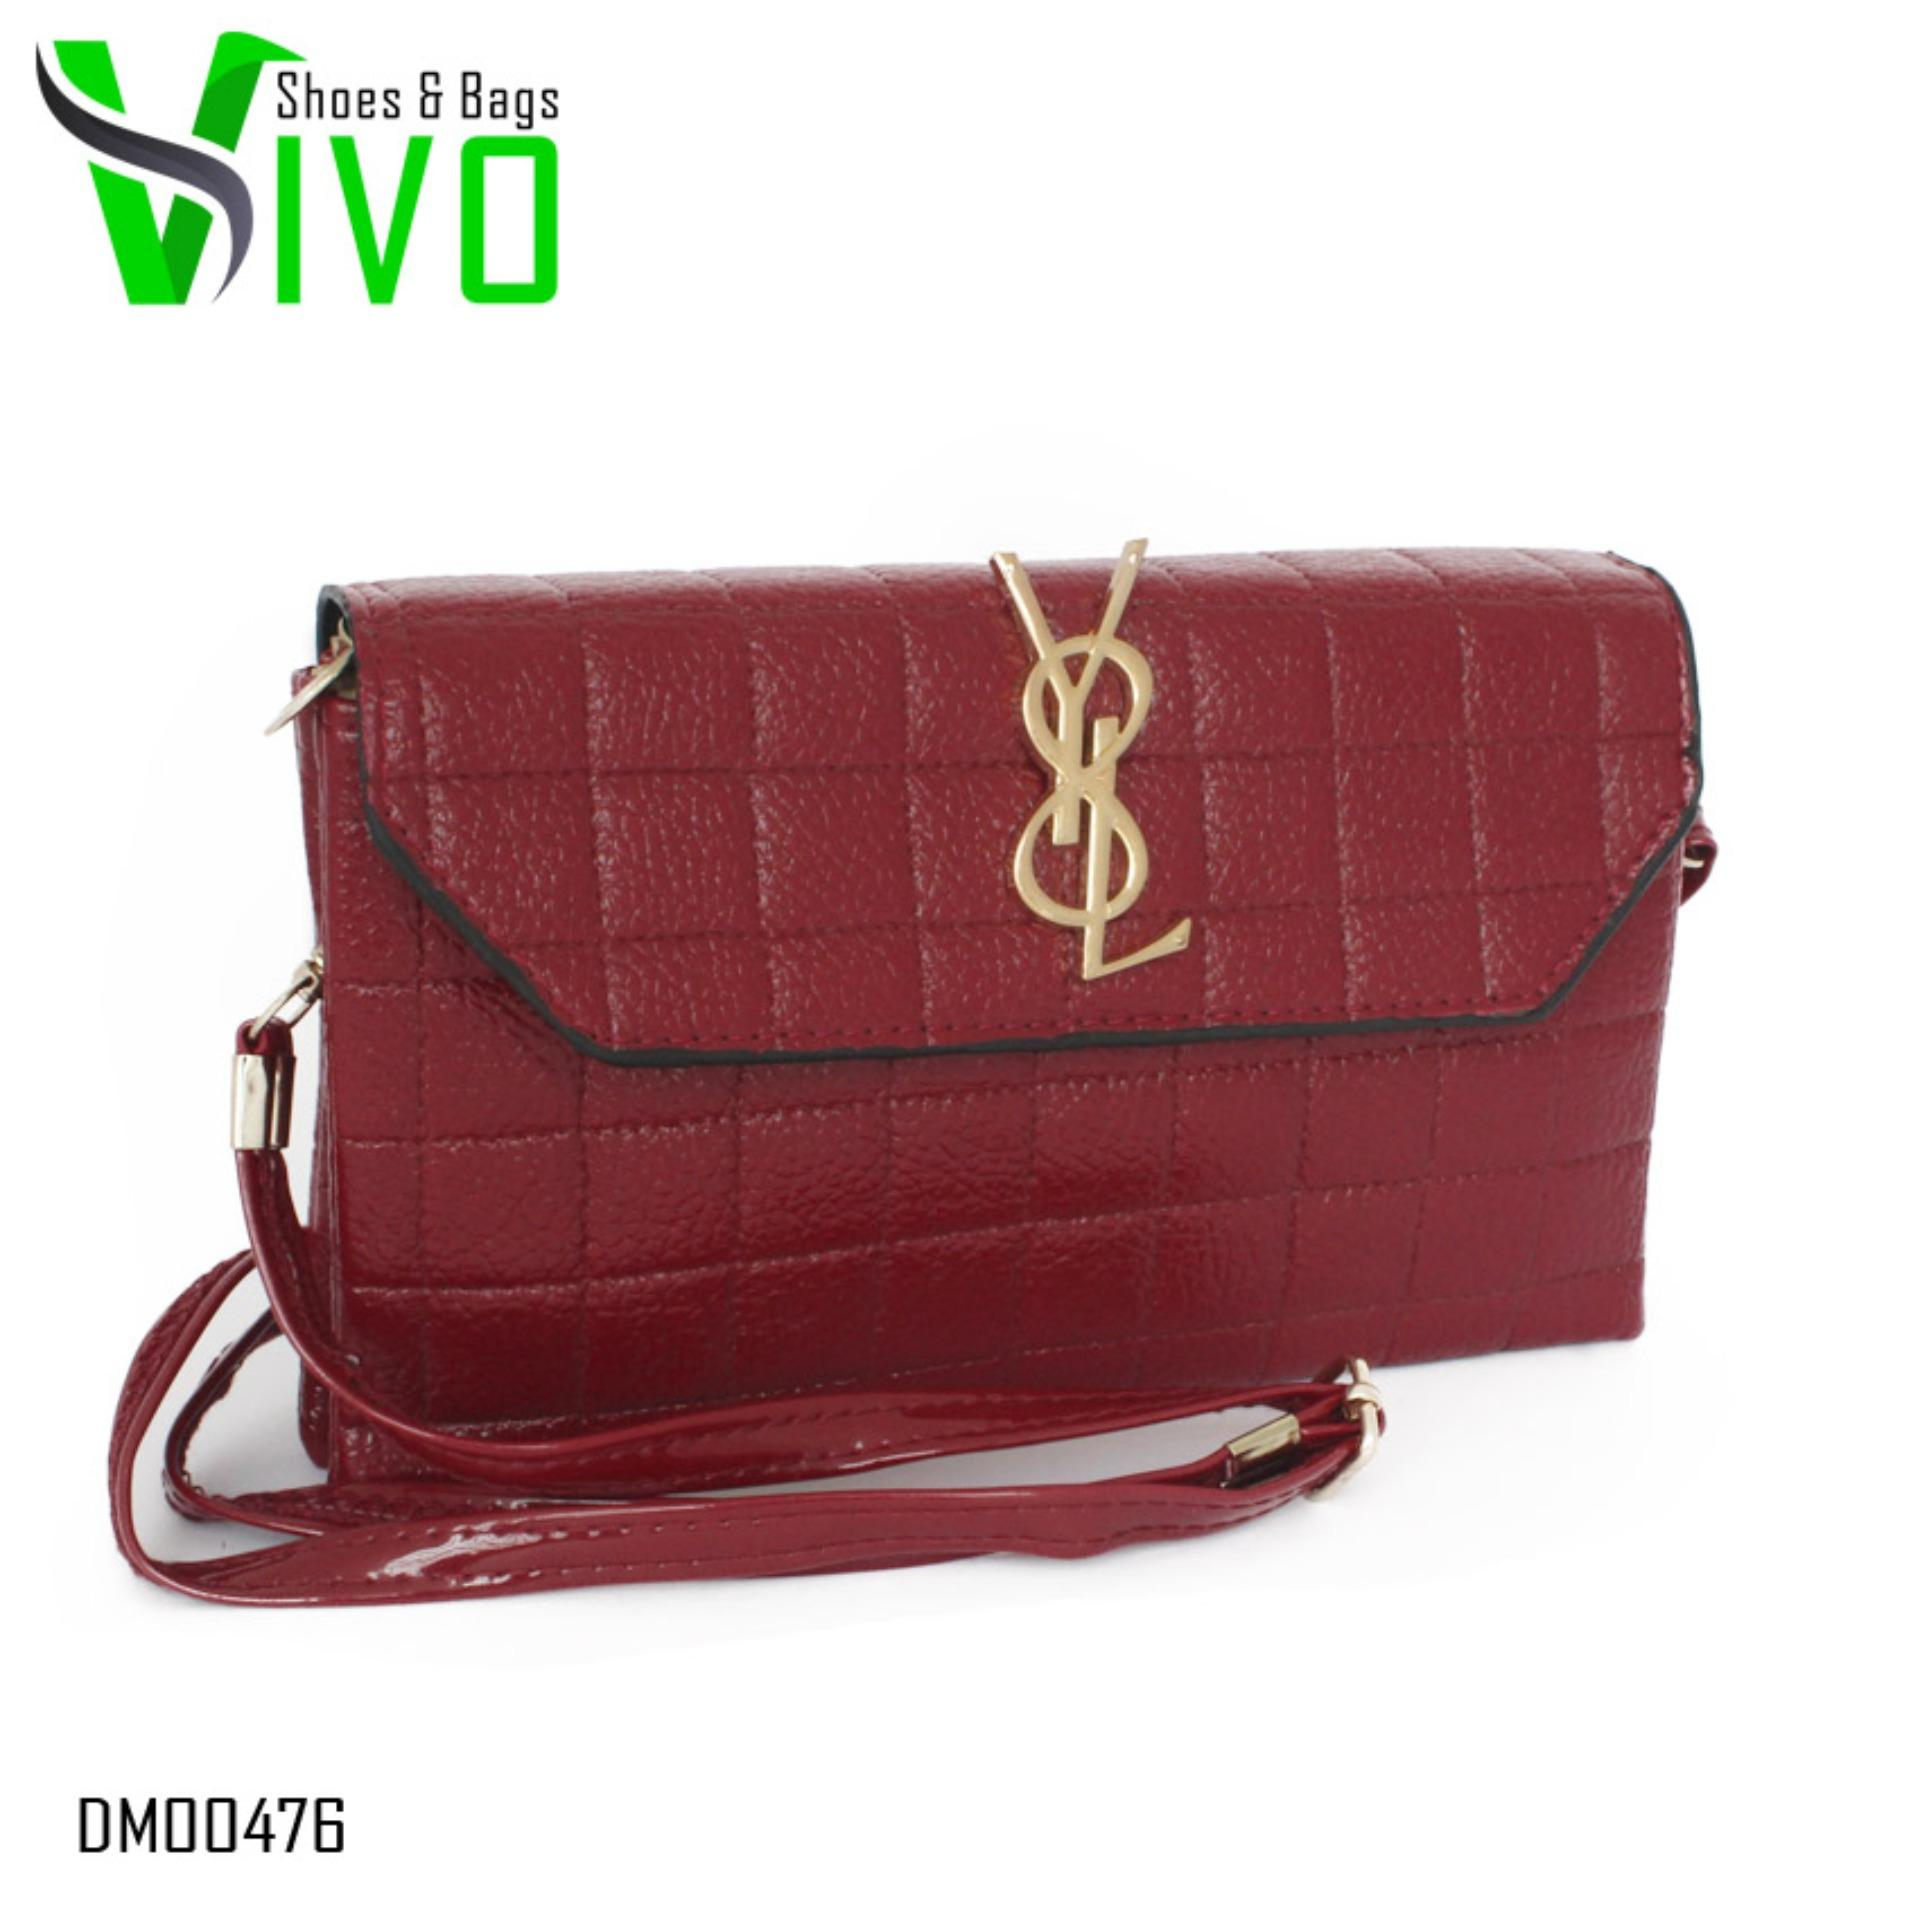 Jual Dompet Impor Panjang Pria Multifungsi Serbaguna Simple Keren Source Vivo Shoes &